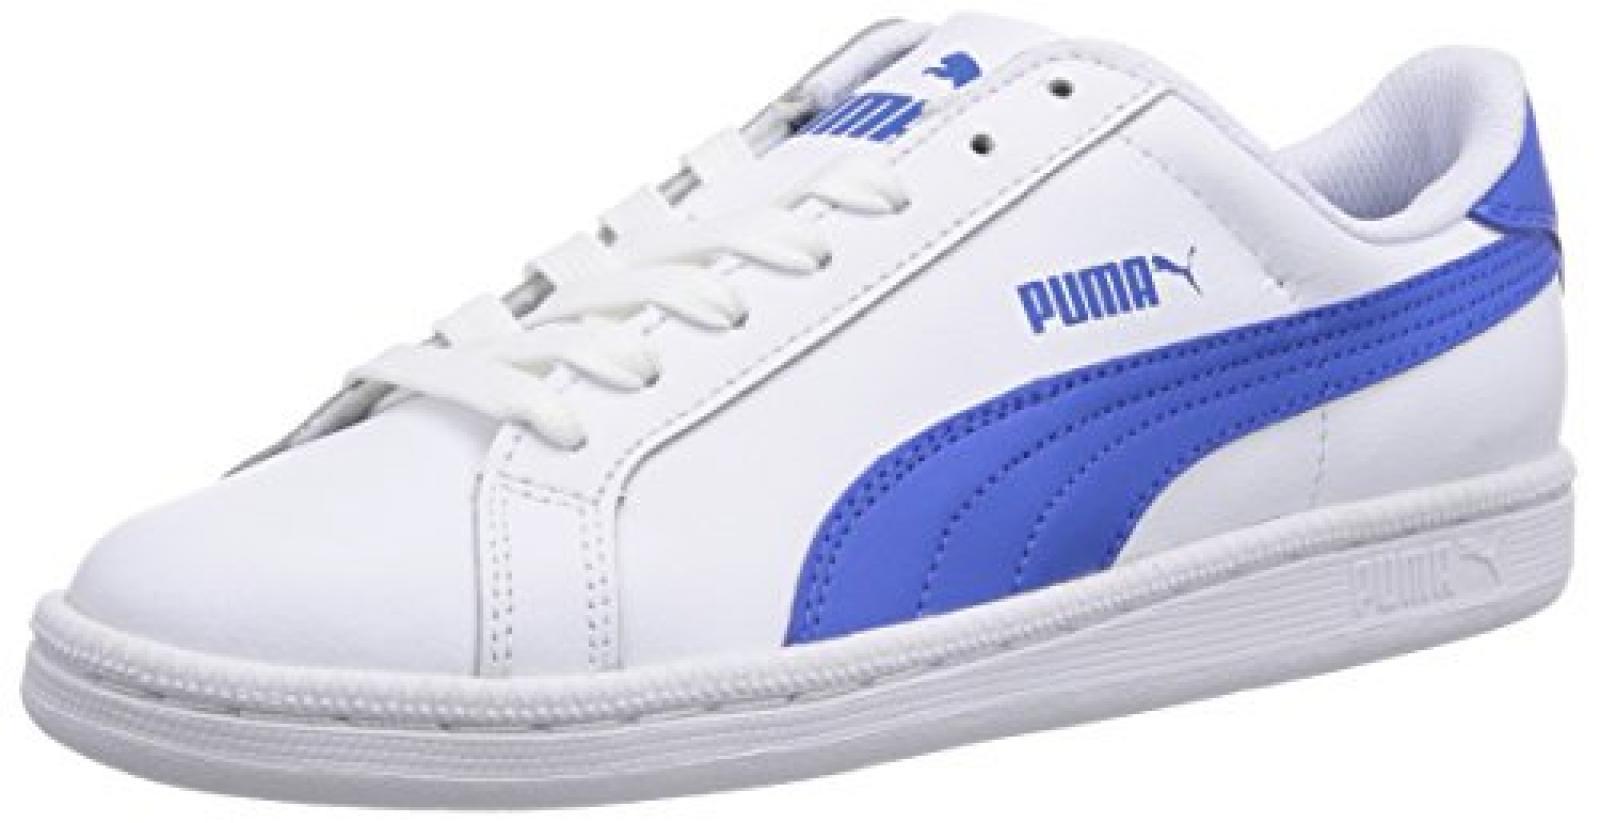 Puma Smash L Unisex-Erwachsene Sneakers